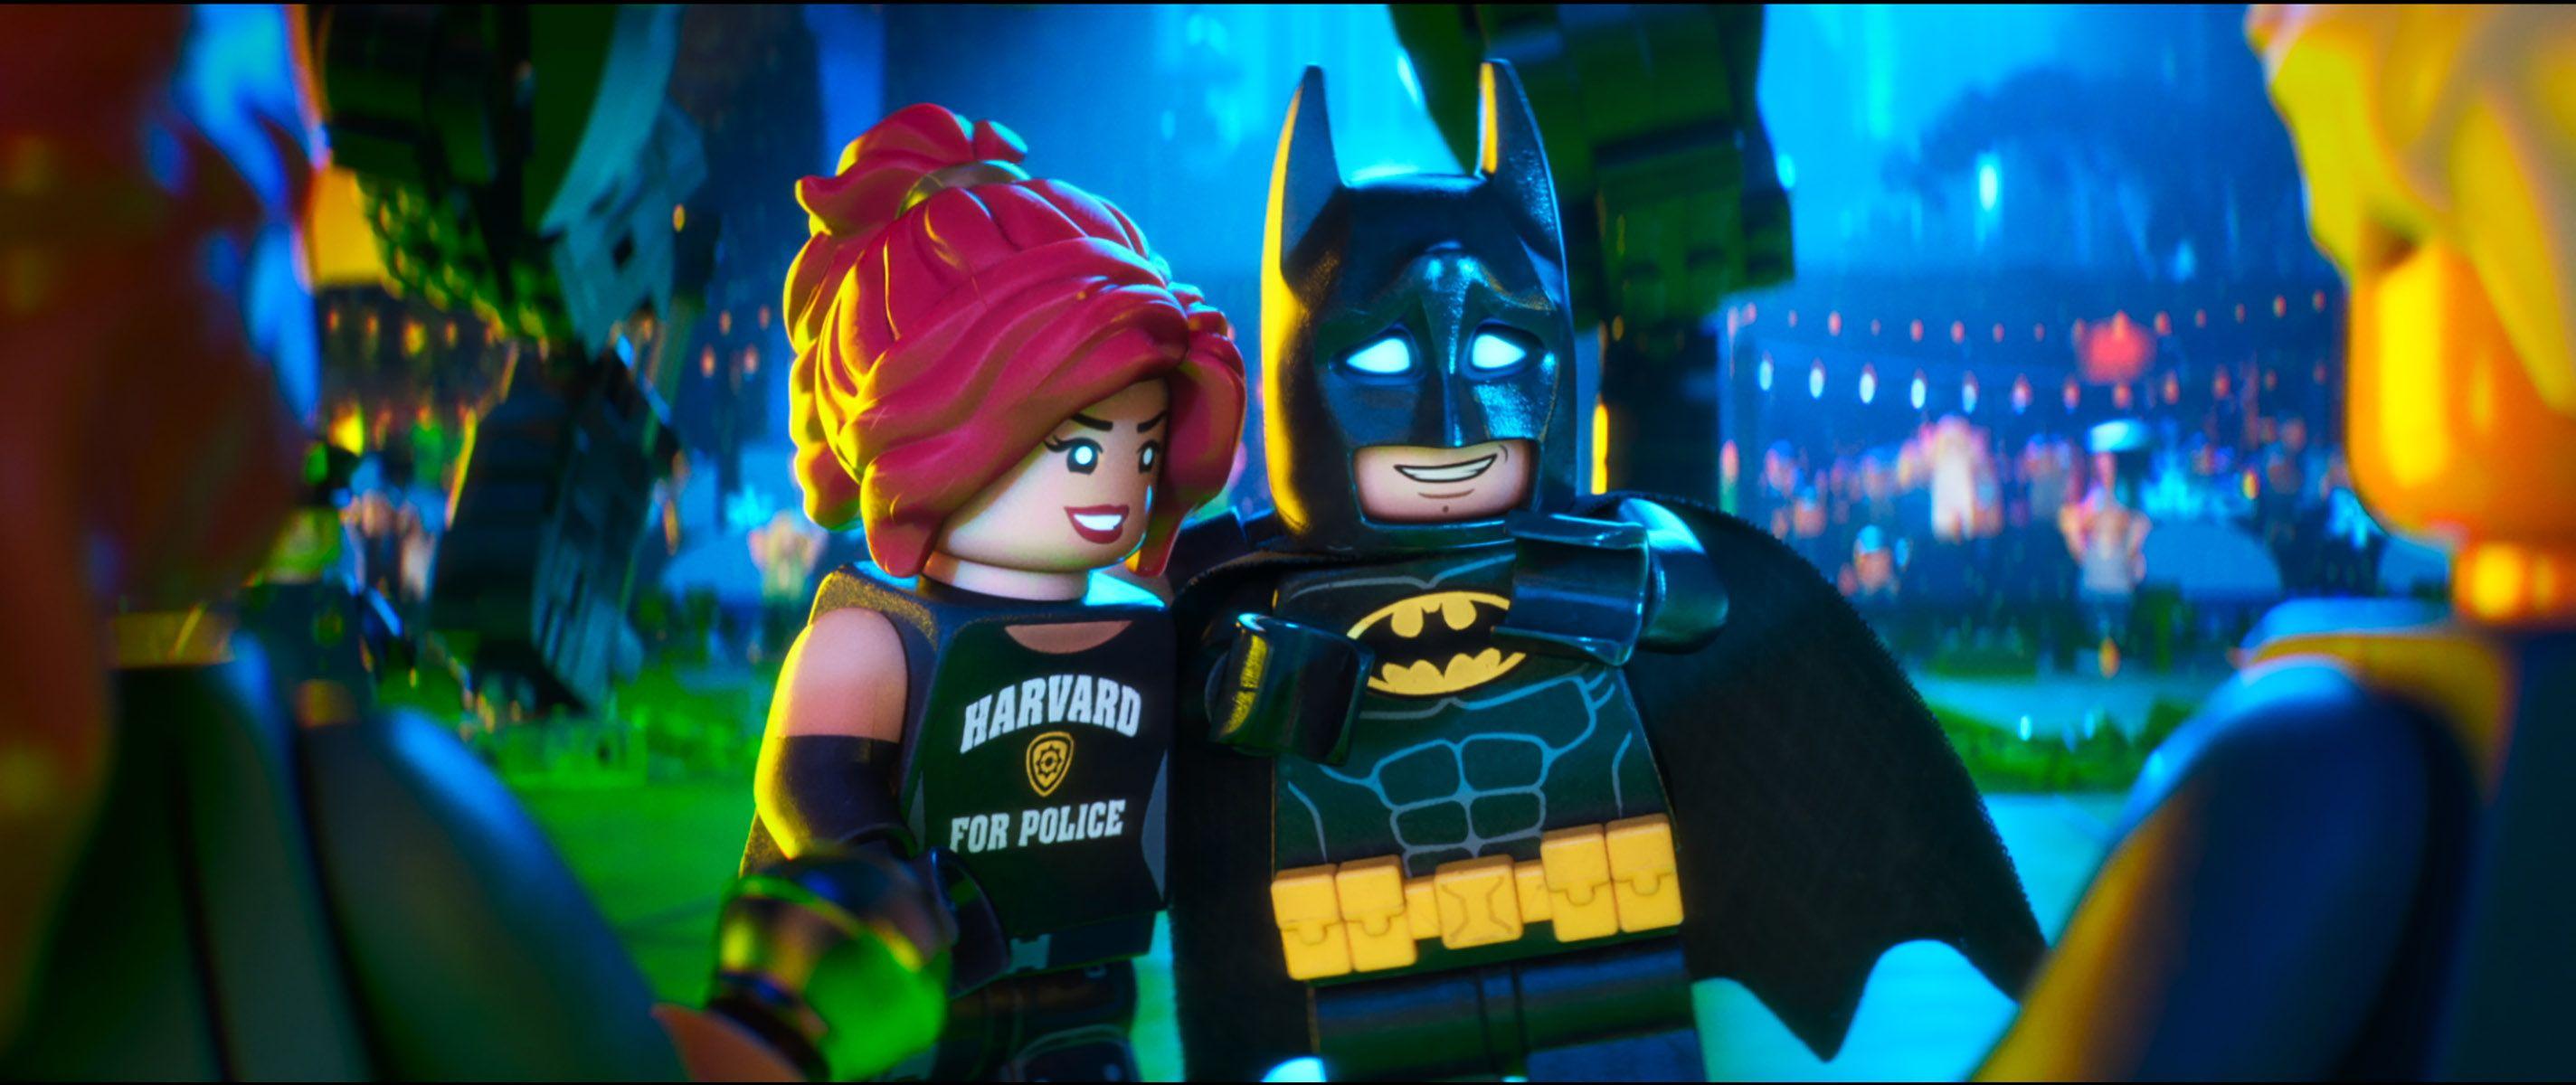 The LEGO Batman Movie Images: 29 Hi-Res Photos | Collider